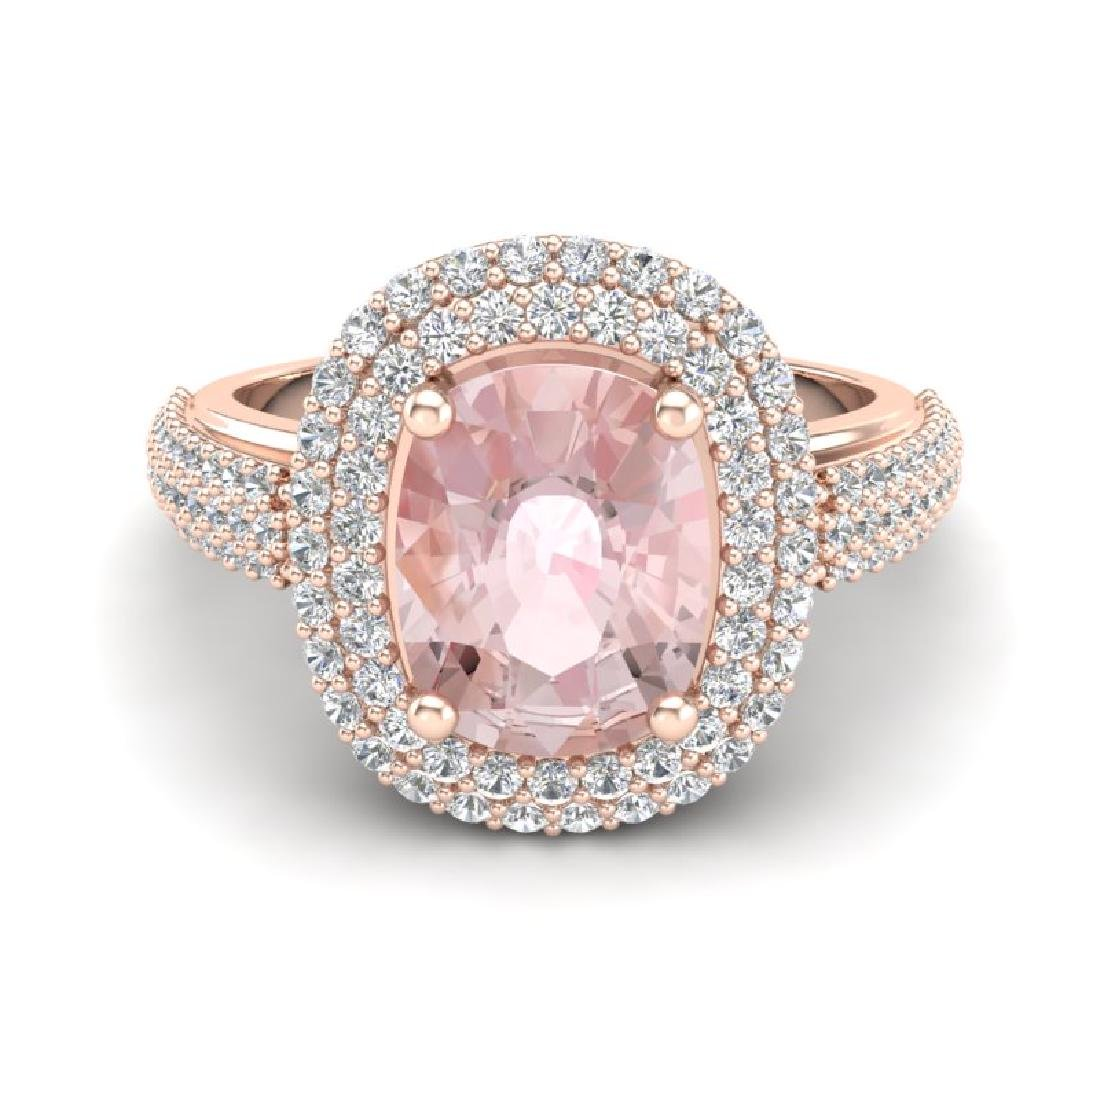 3.25 CTW Morganite & Micro Pave VS/SI Diamond Halo Ring